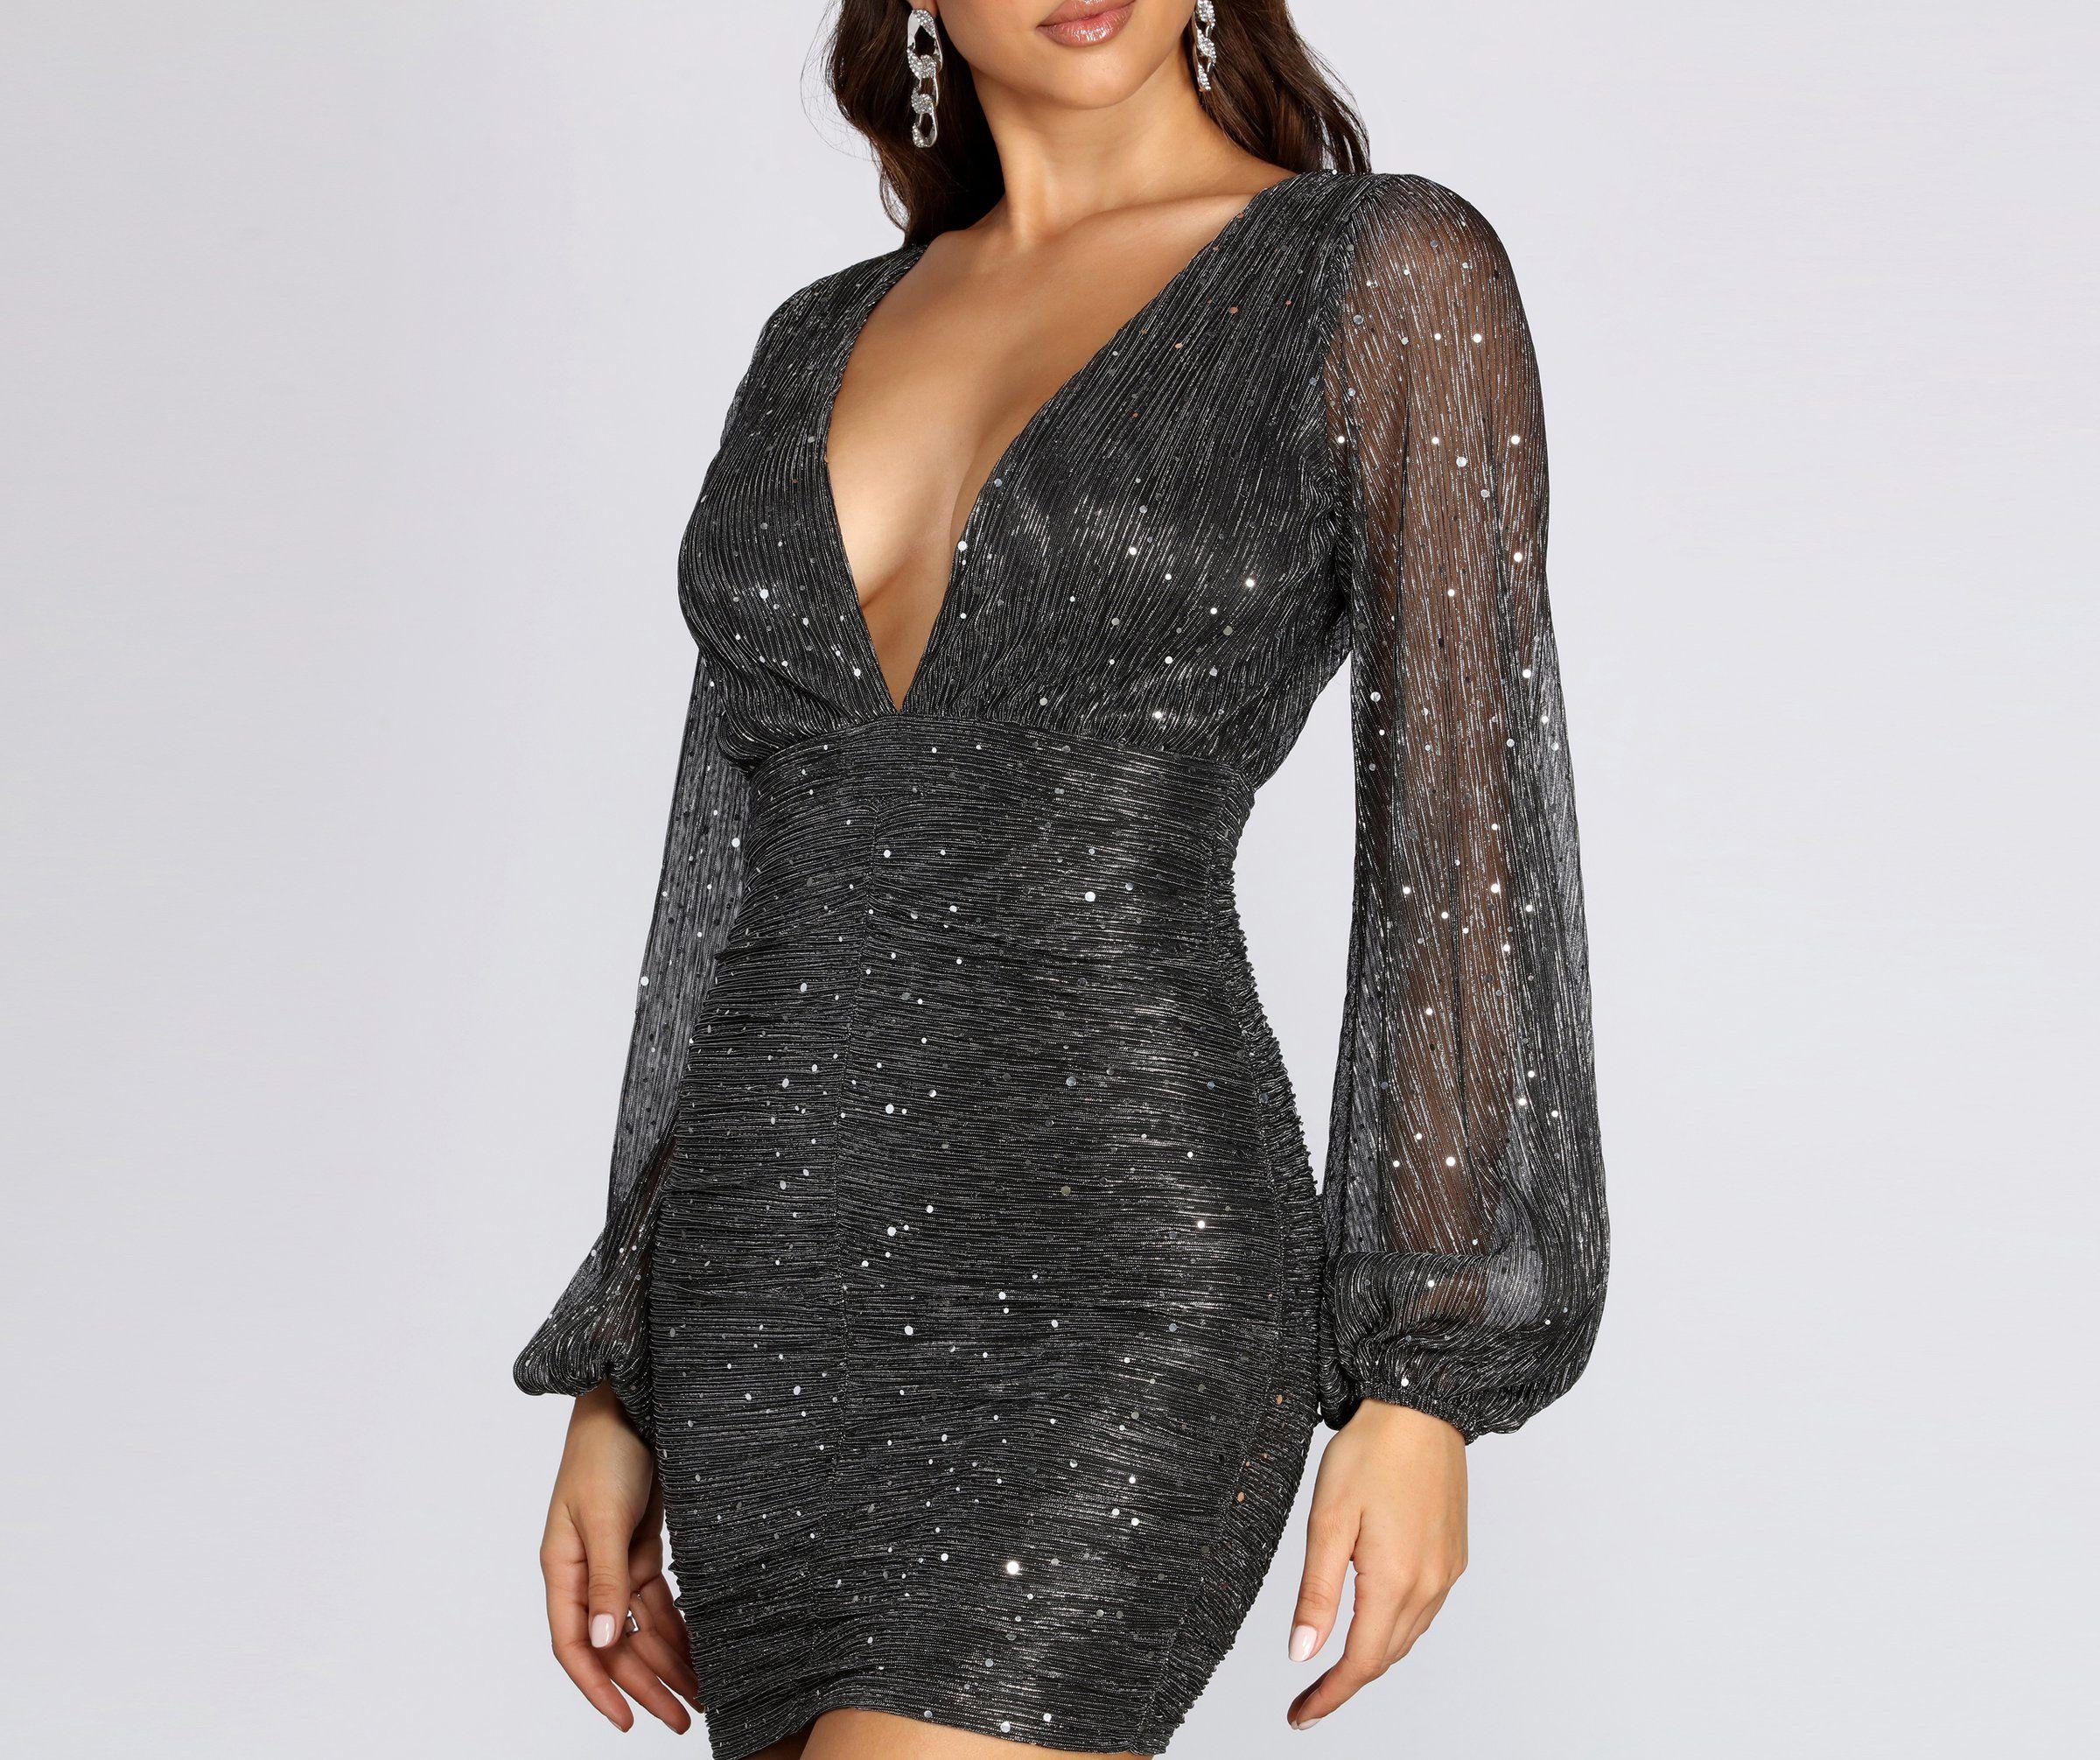 Kayden Sequin Glitter Party Dress In 2021 Glitter Party Dress Party Dress Long Sleeve Cocktail Dress [ 2011 x 2400 Pixel ]